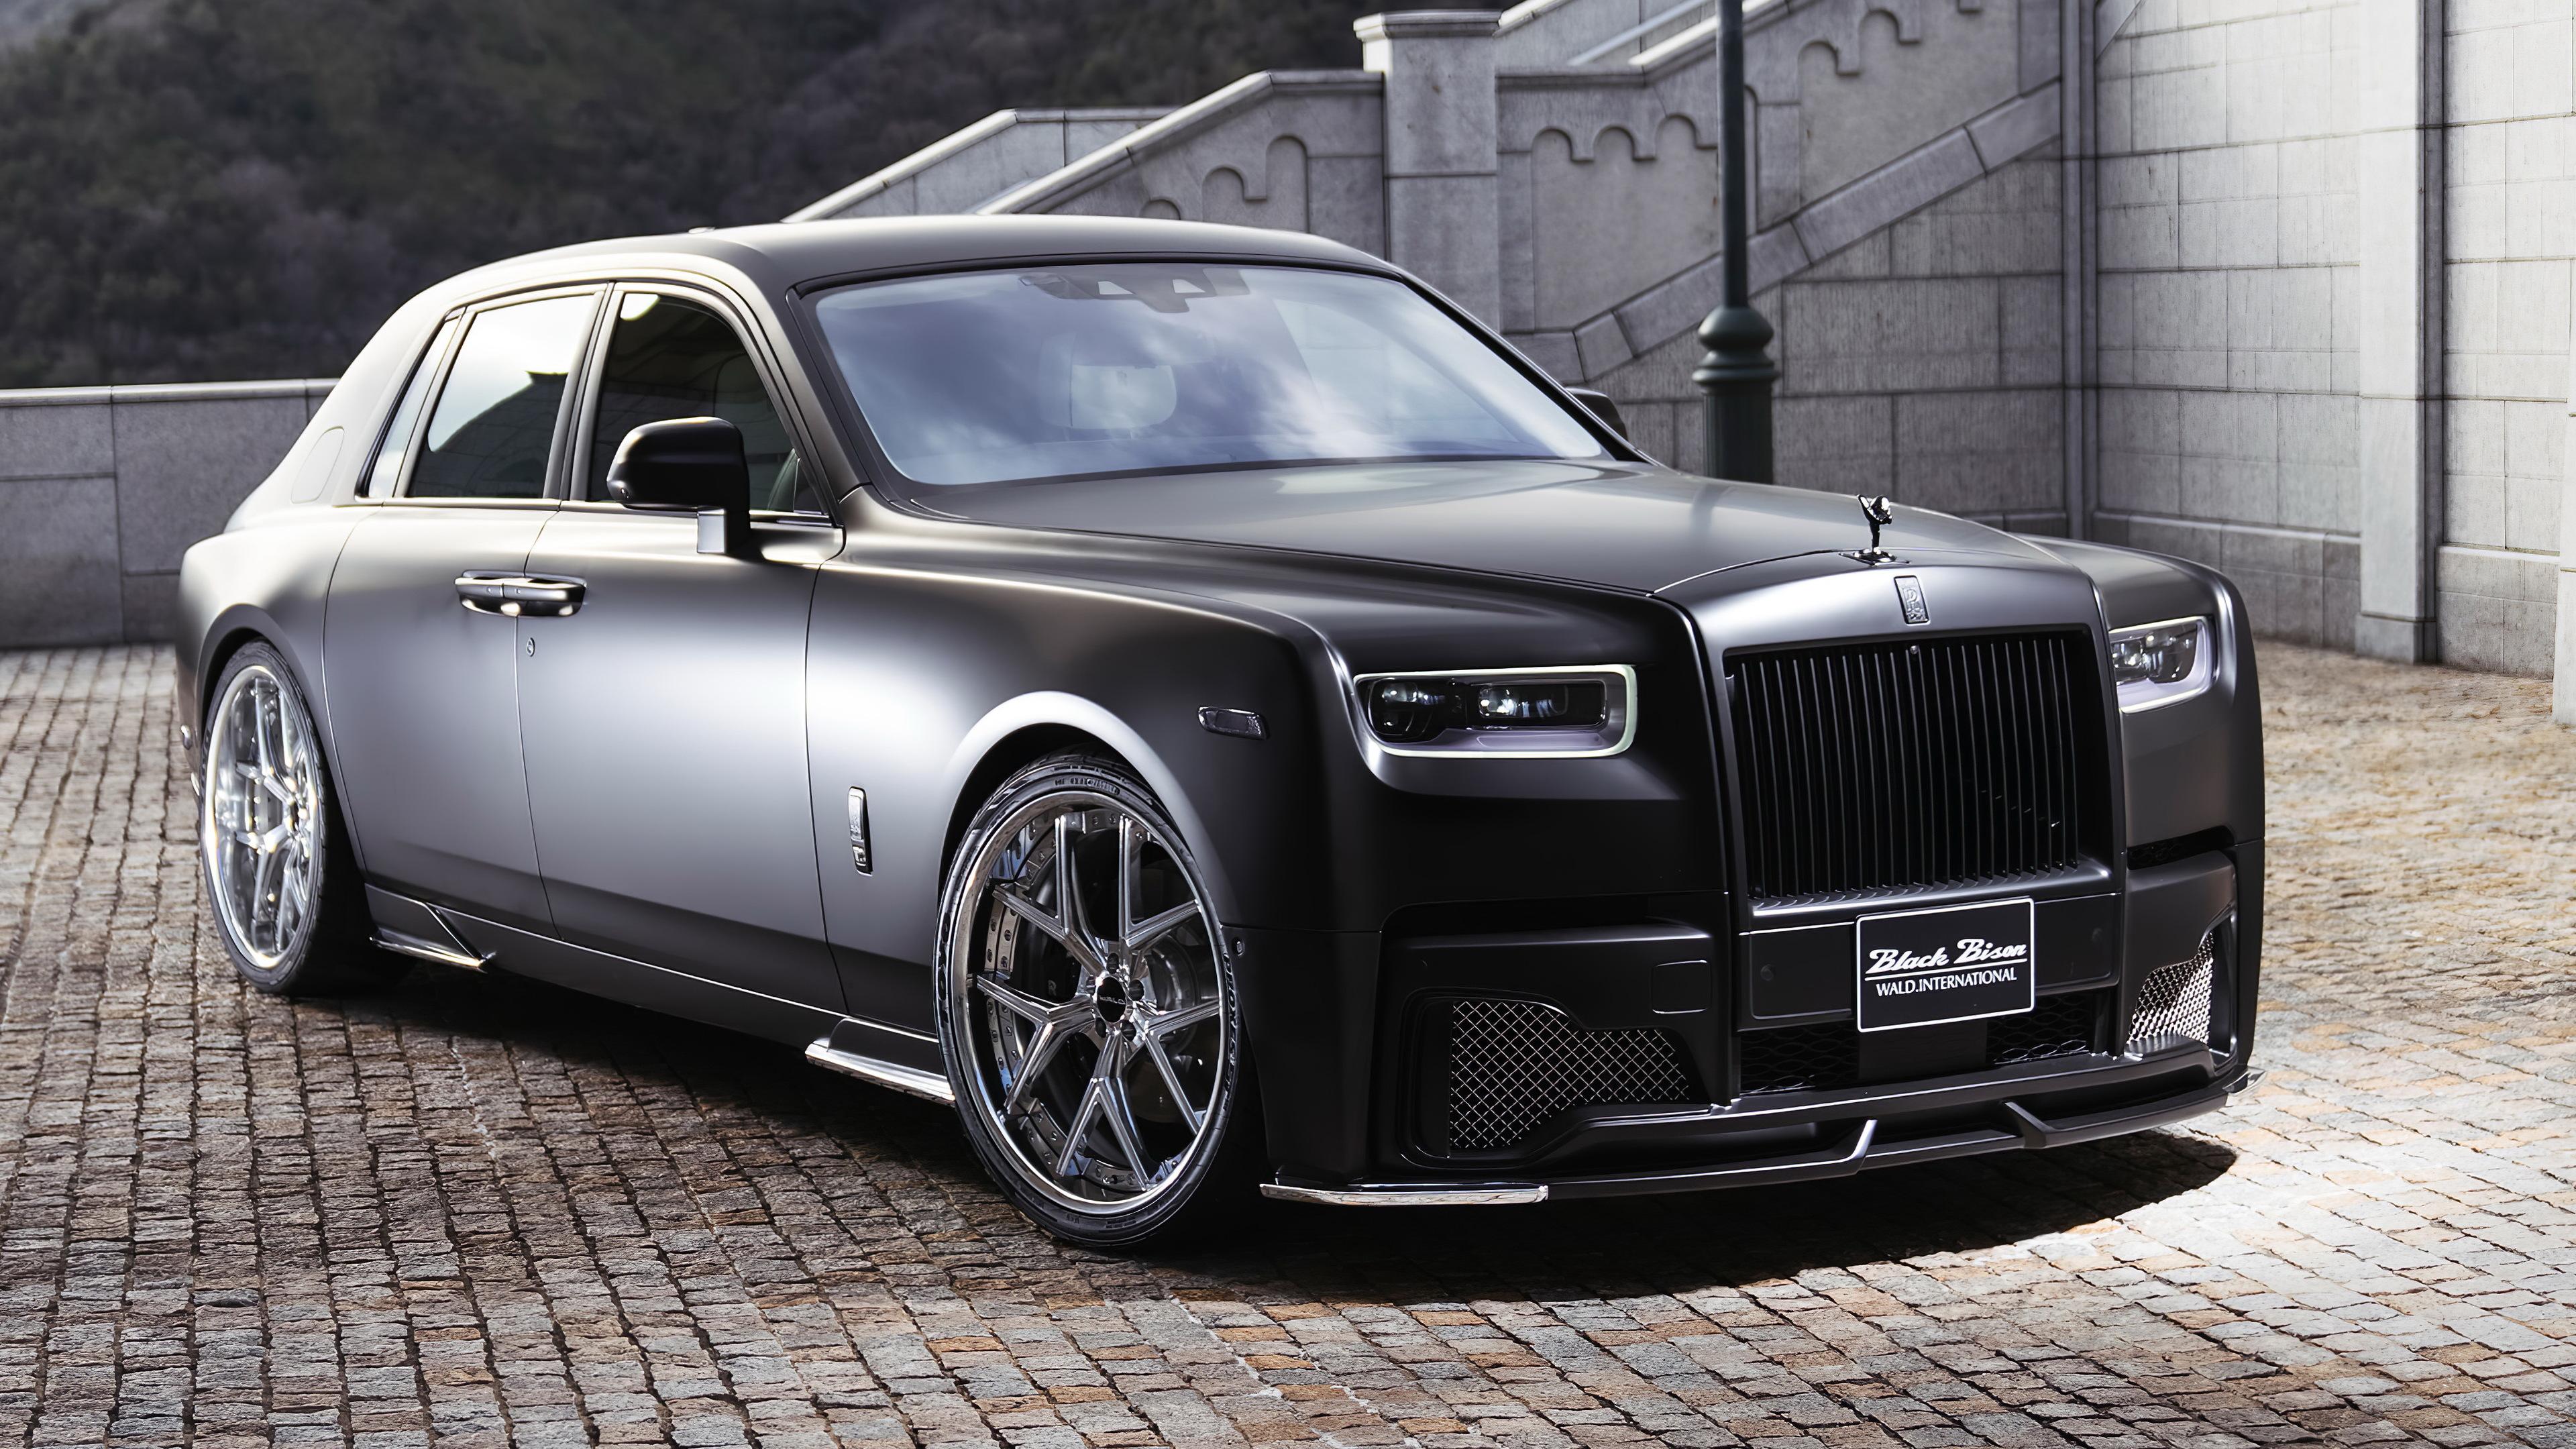 rolls royce phantom sports line black bison edition 2019 4k 1560534301 - Rolls Royce Phantom Sports Line Black Bison Edition 2019 4k - rolls royce wraith wallpapers, rolls royce wallpapers, hd-wallpapers, cars wallpapers, 4k-wallpapers